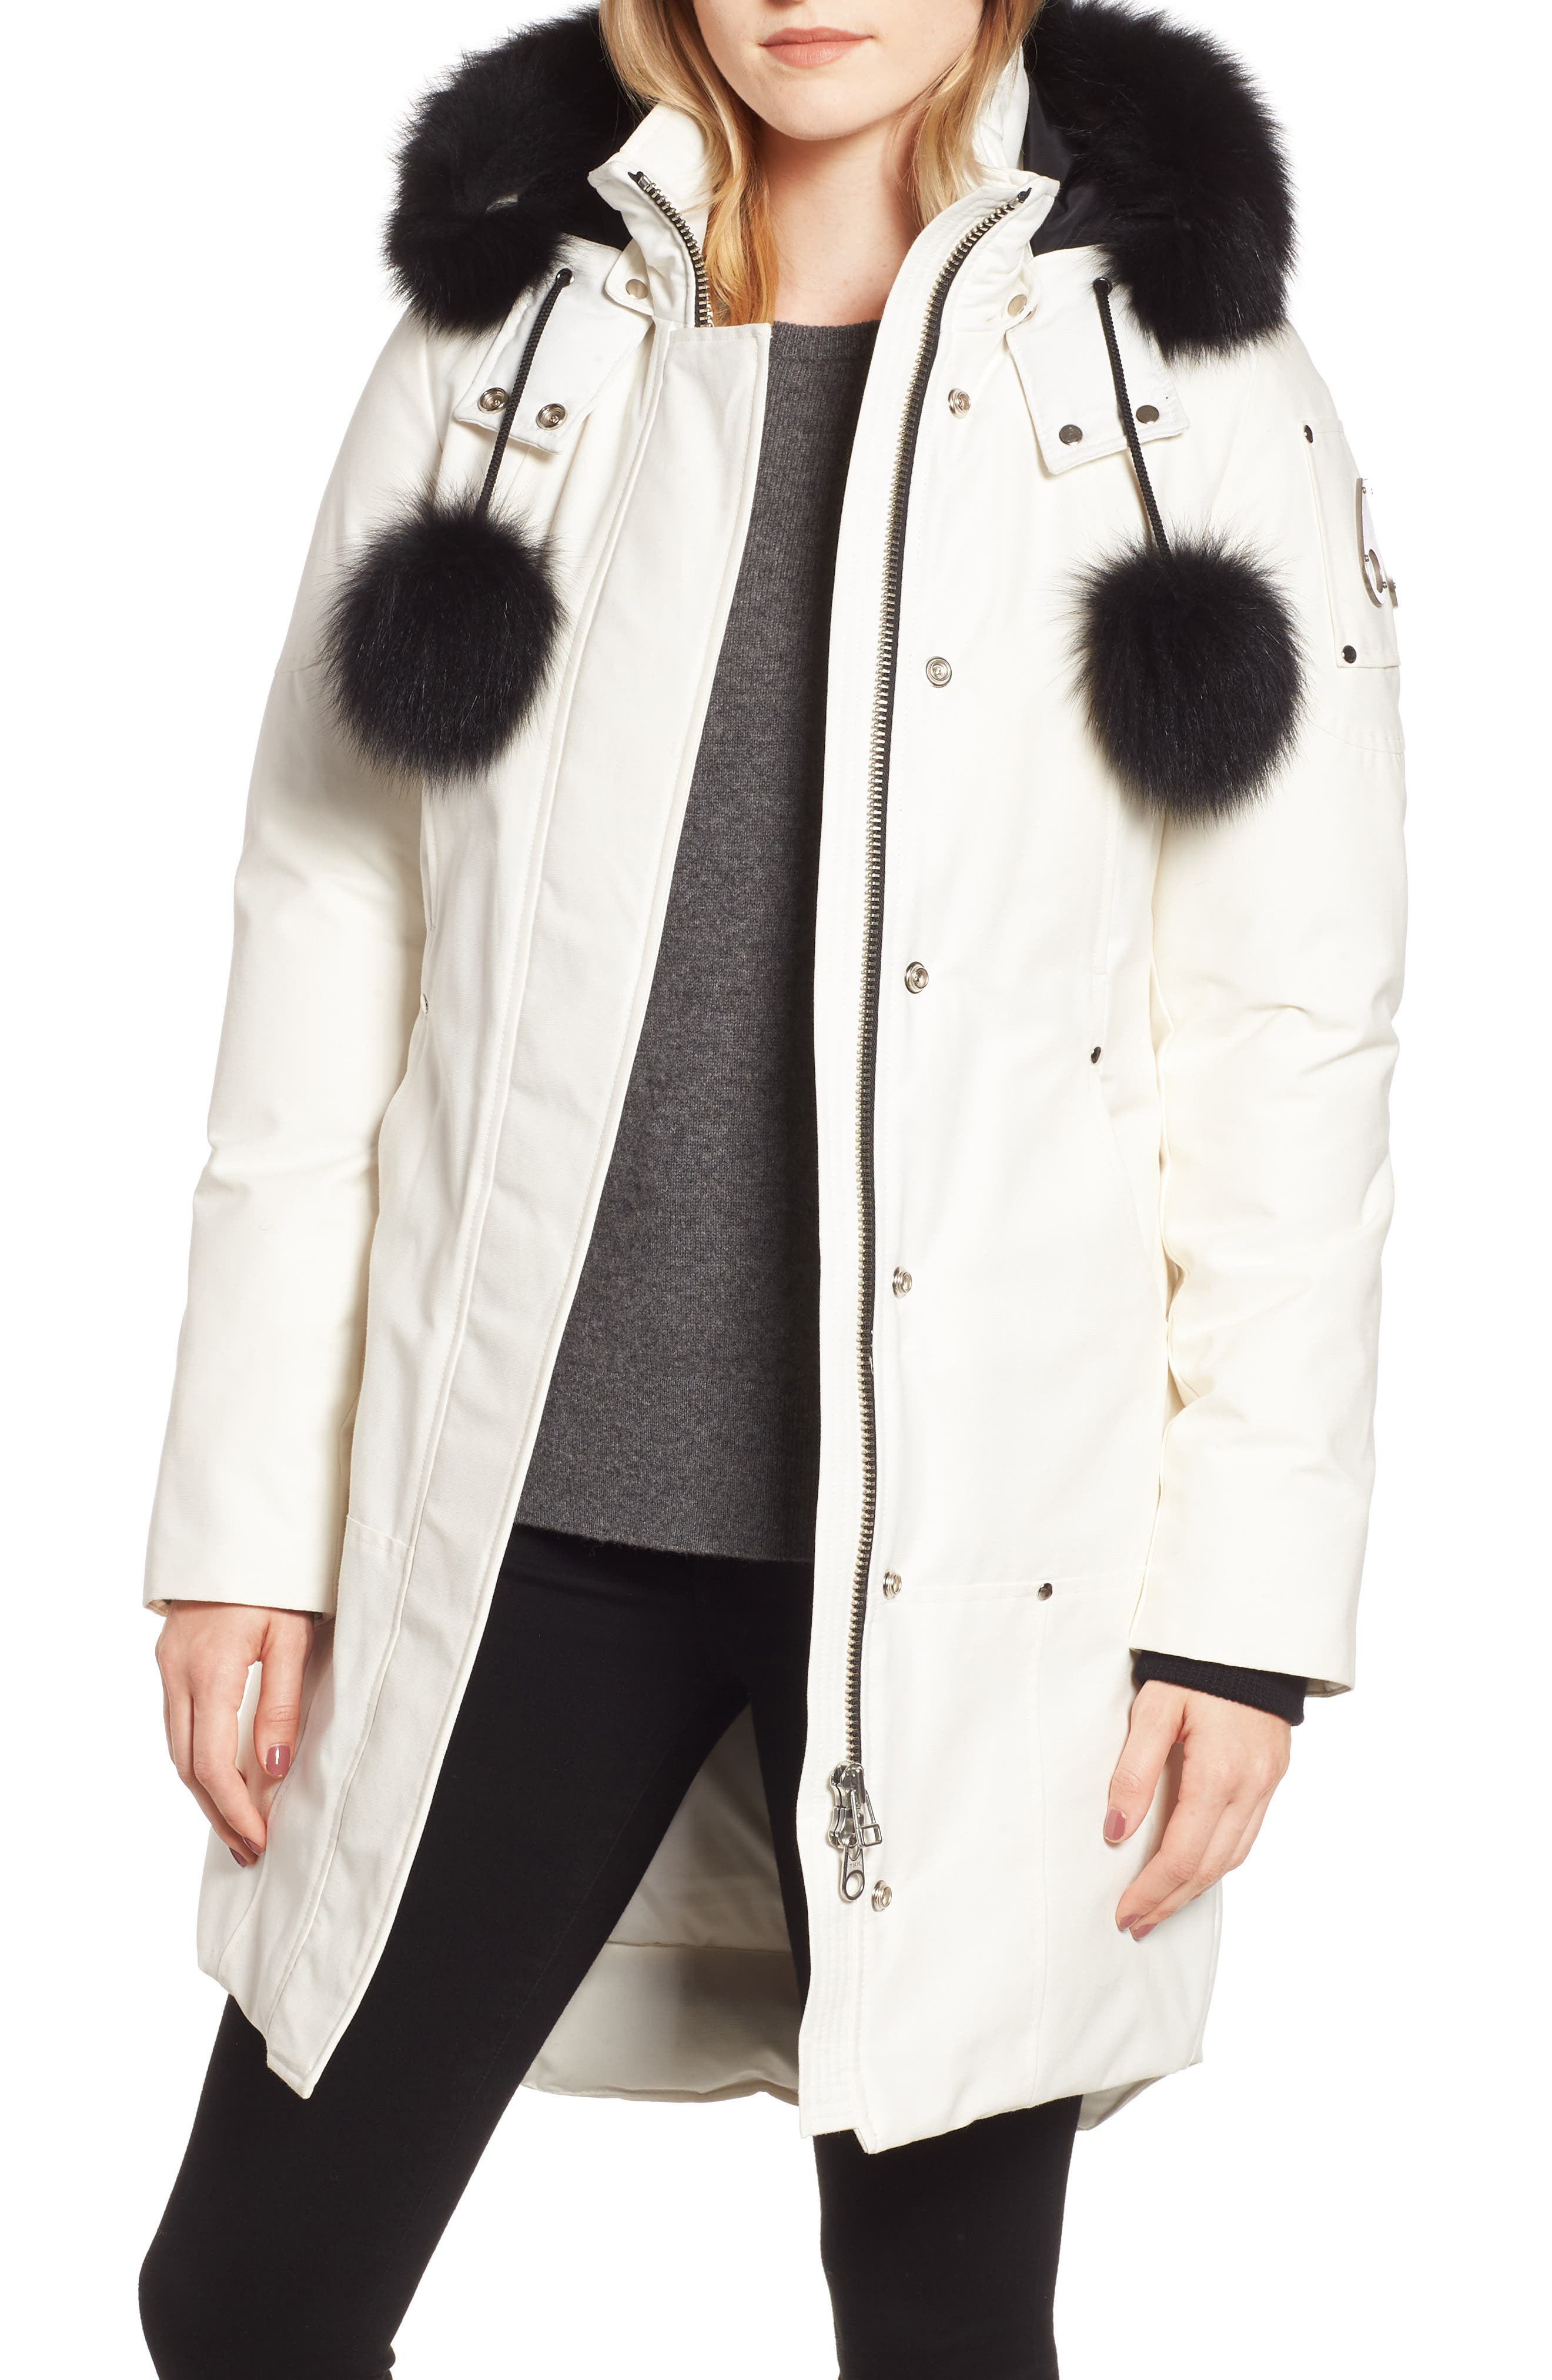 'Stirling' Down Parka with Genuine Fox Fur Trim,                             Main thumbnail 1, color,                             SNOW WHITE/ BLACK FOX